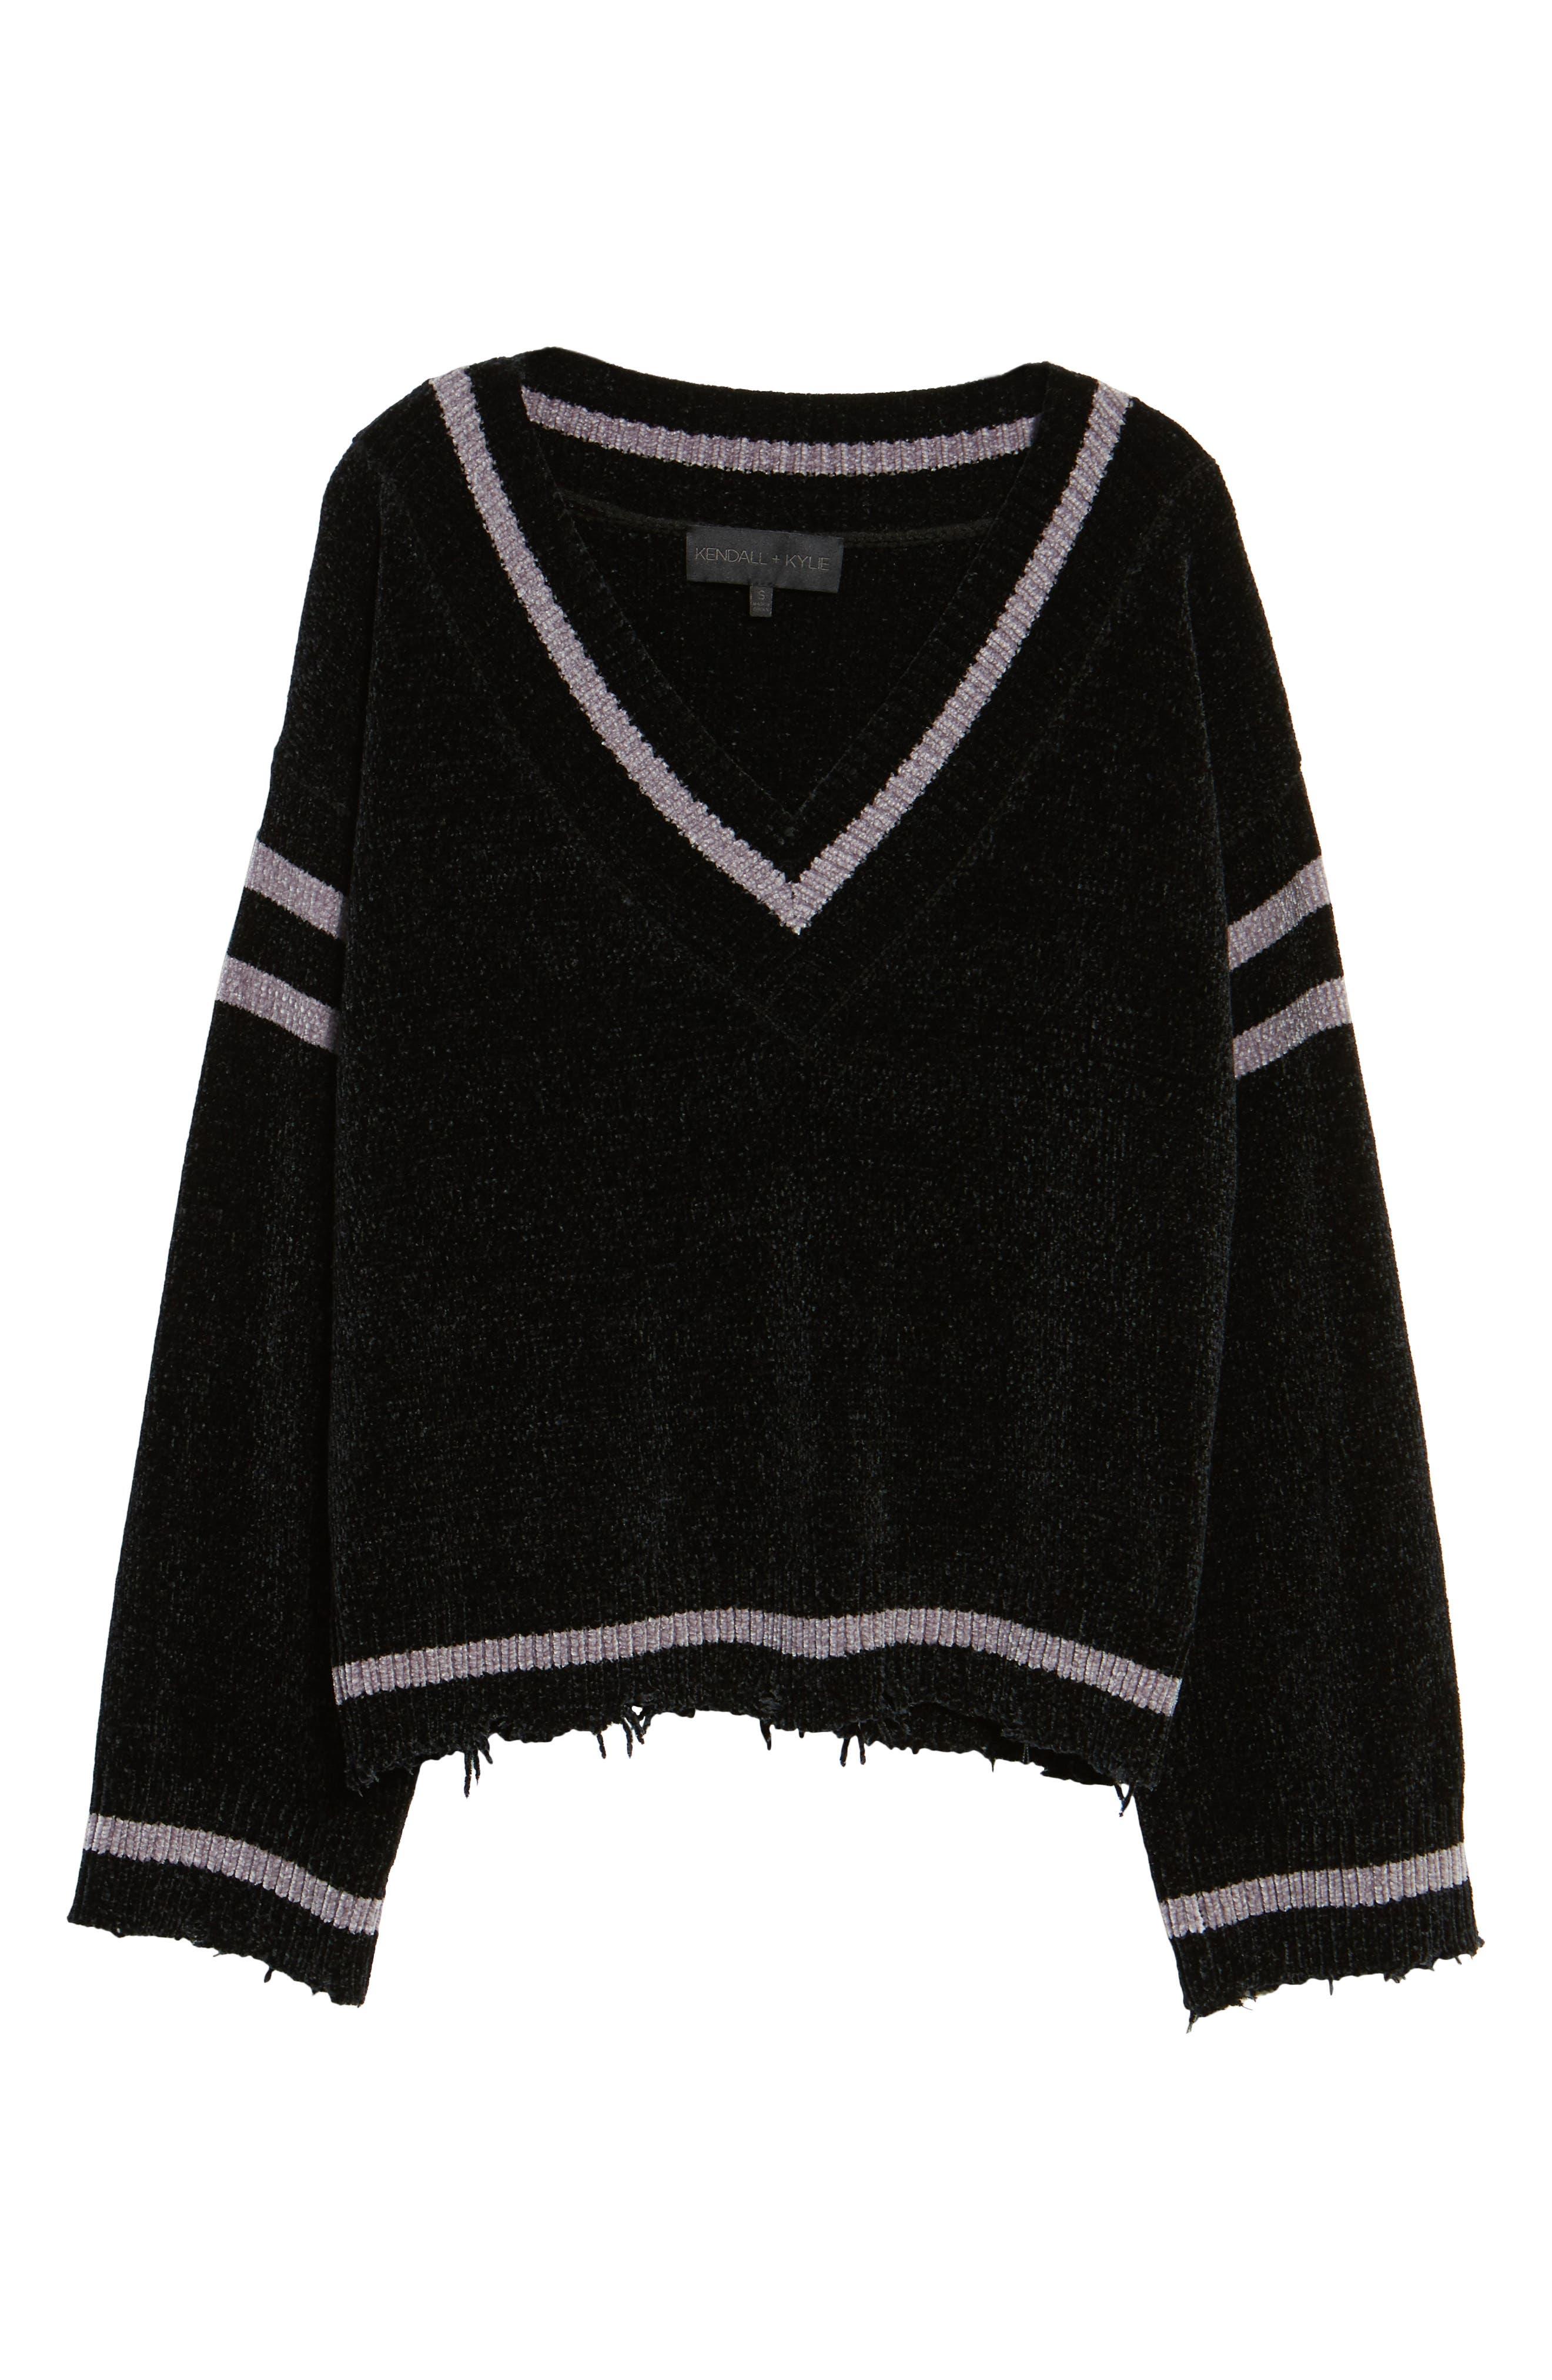 Oversize V-Neck Sweater,                             Alternate thumbnail 6, color,                             BLACK/ MED. HEATHER GREY